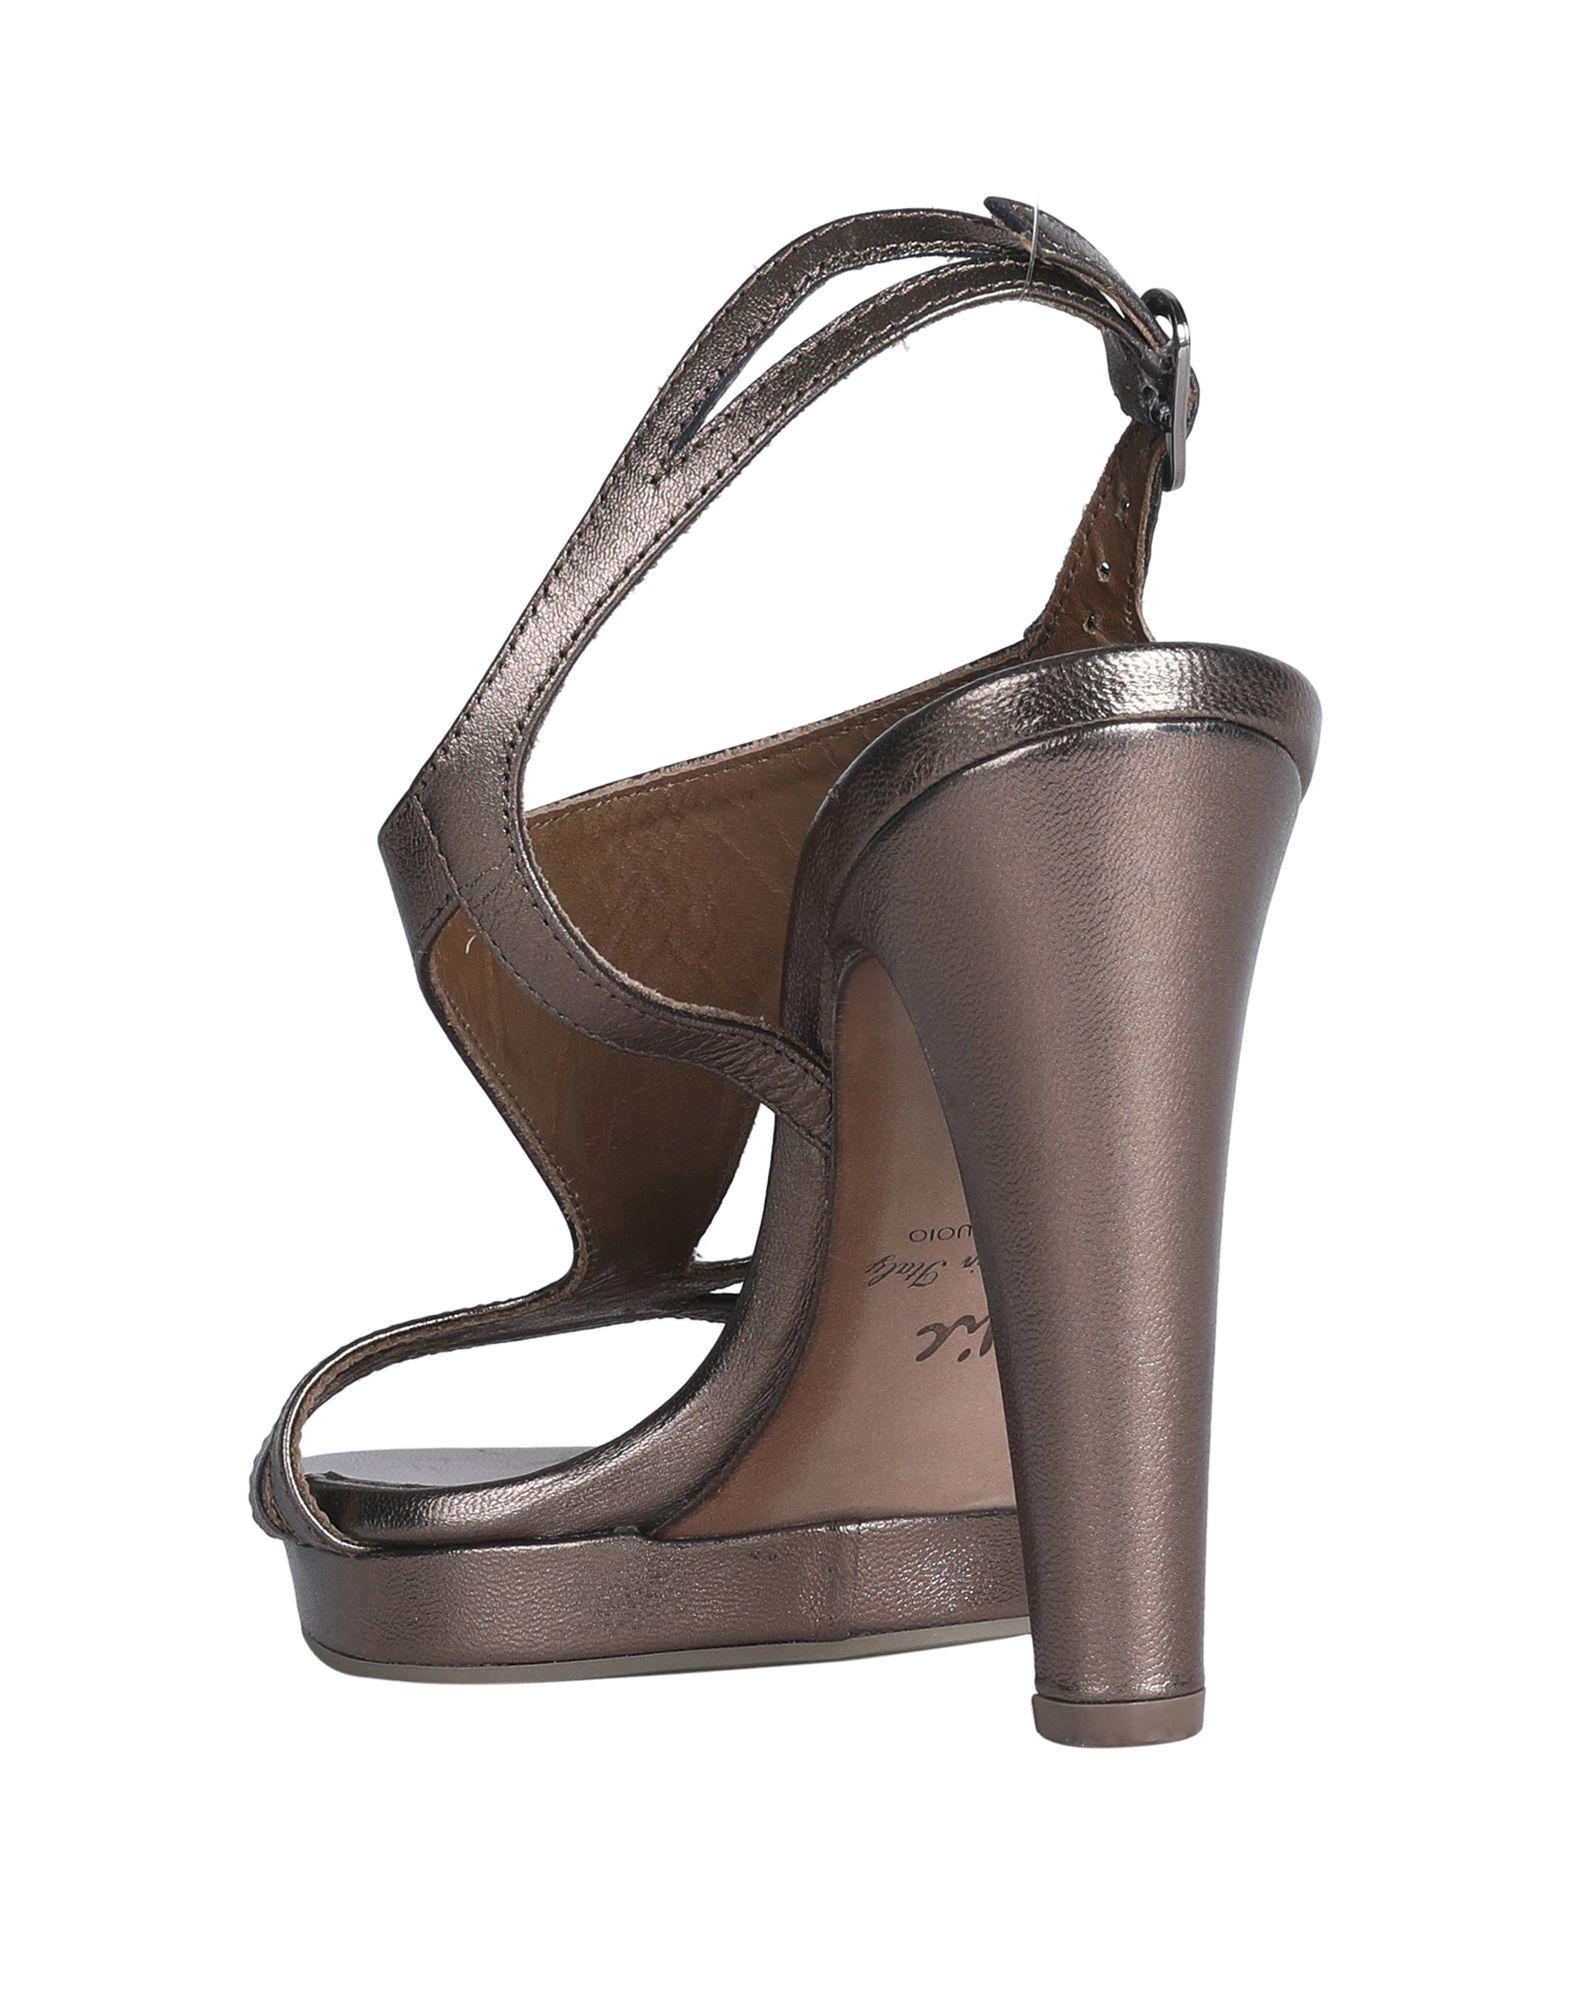 Stilvolle billige Schuhe Damen Vic Sandalen Damen Schuhe  11558036LL adb19f